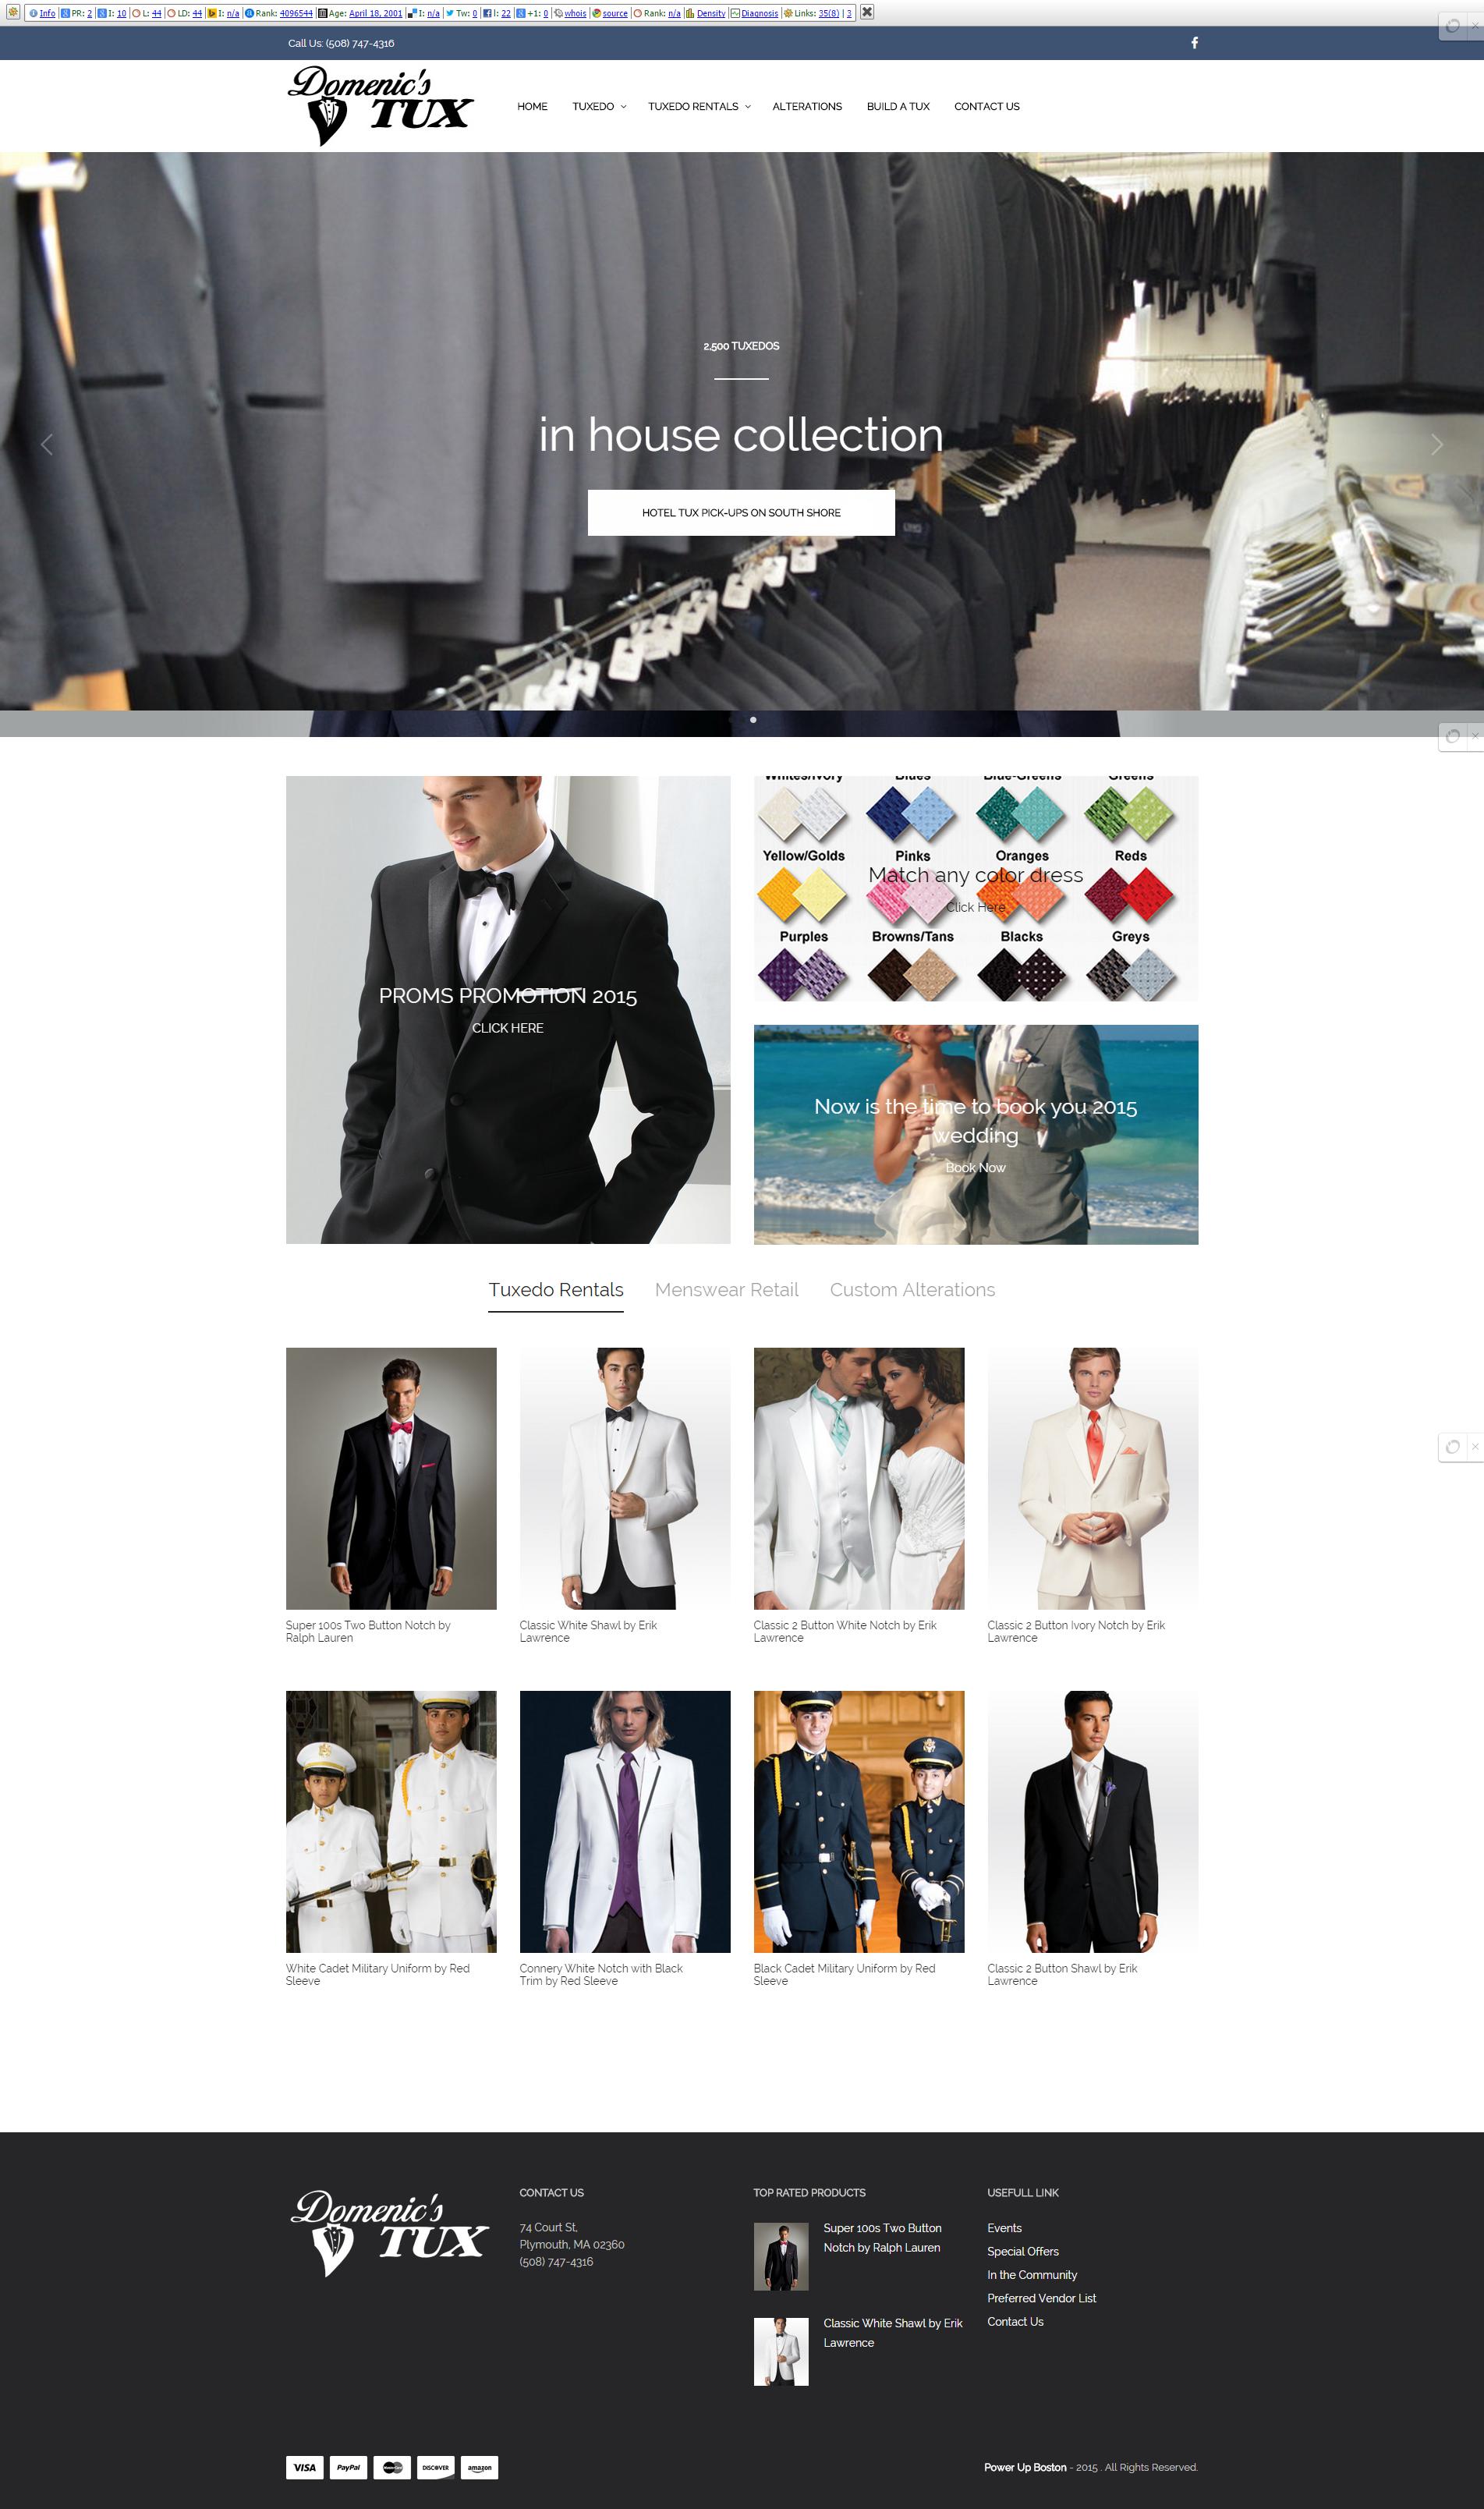 Domenic s Tux   Fine Men s Clothing